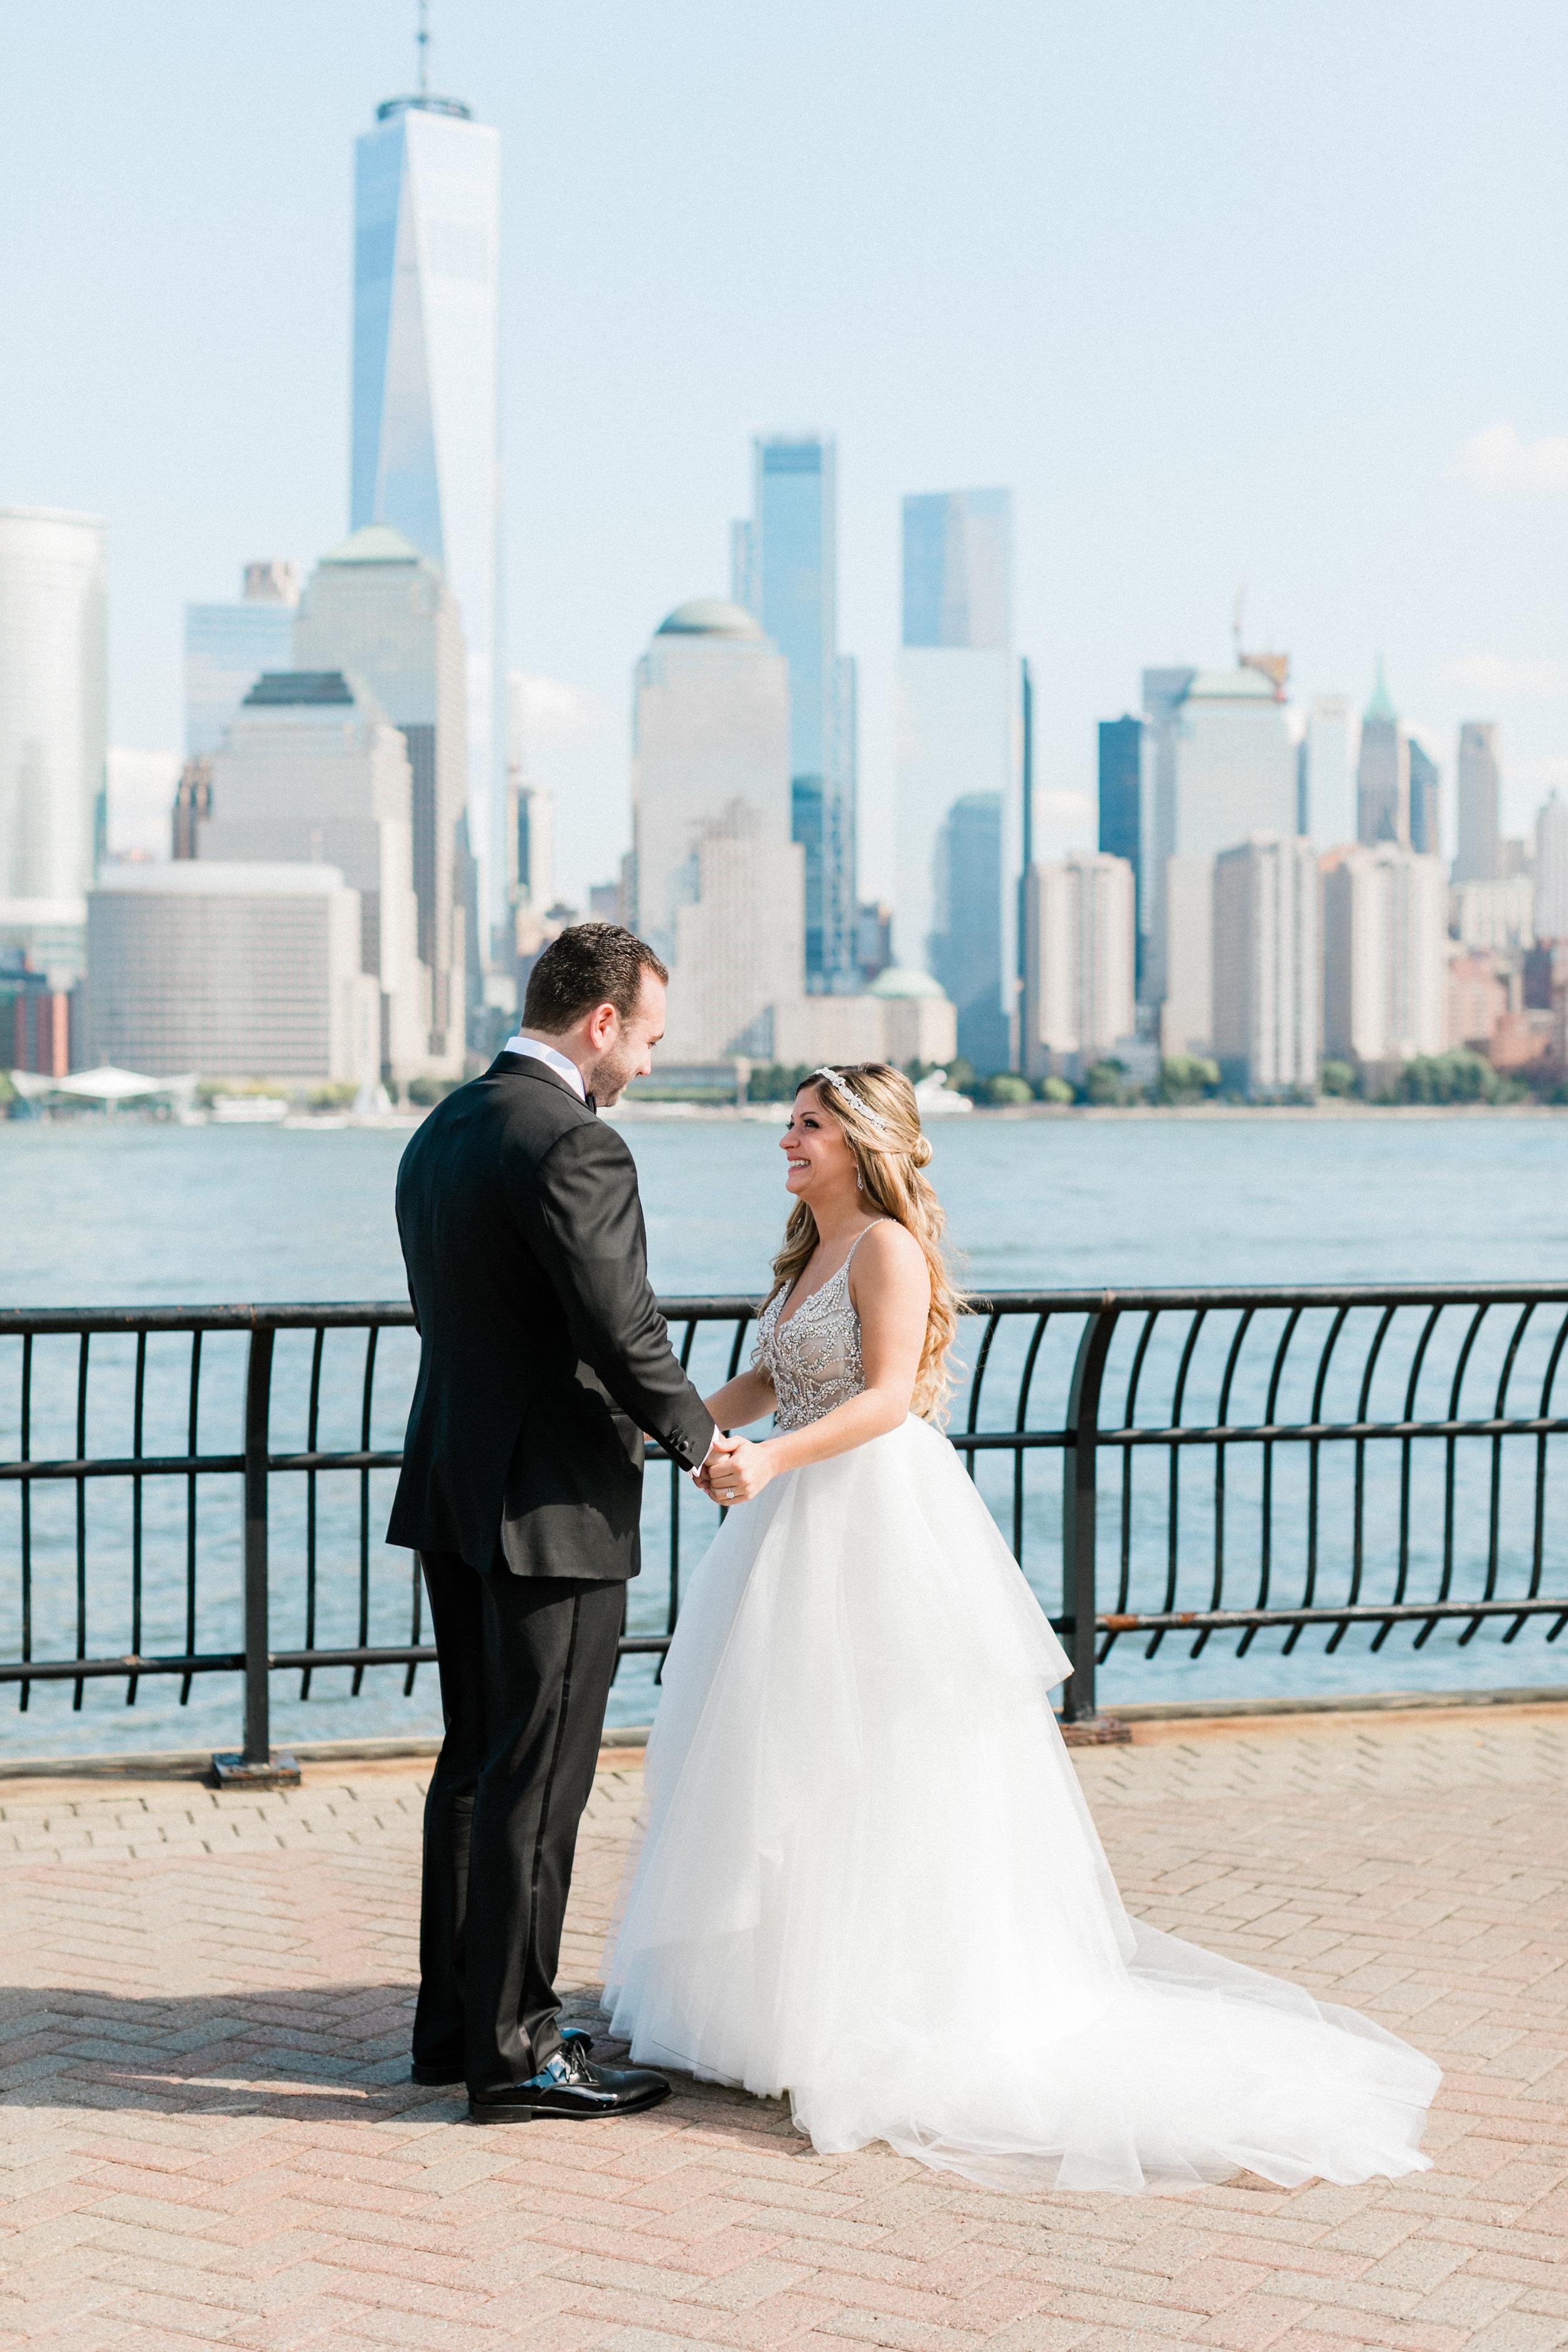 hyatt-regency-jersey-city-wedding-photographer20.jpg